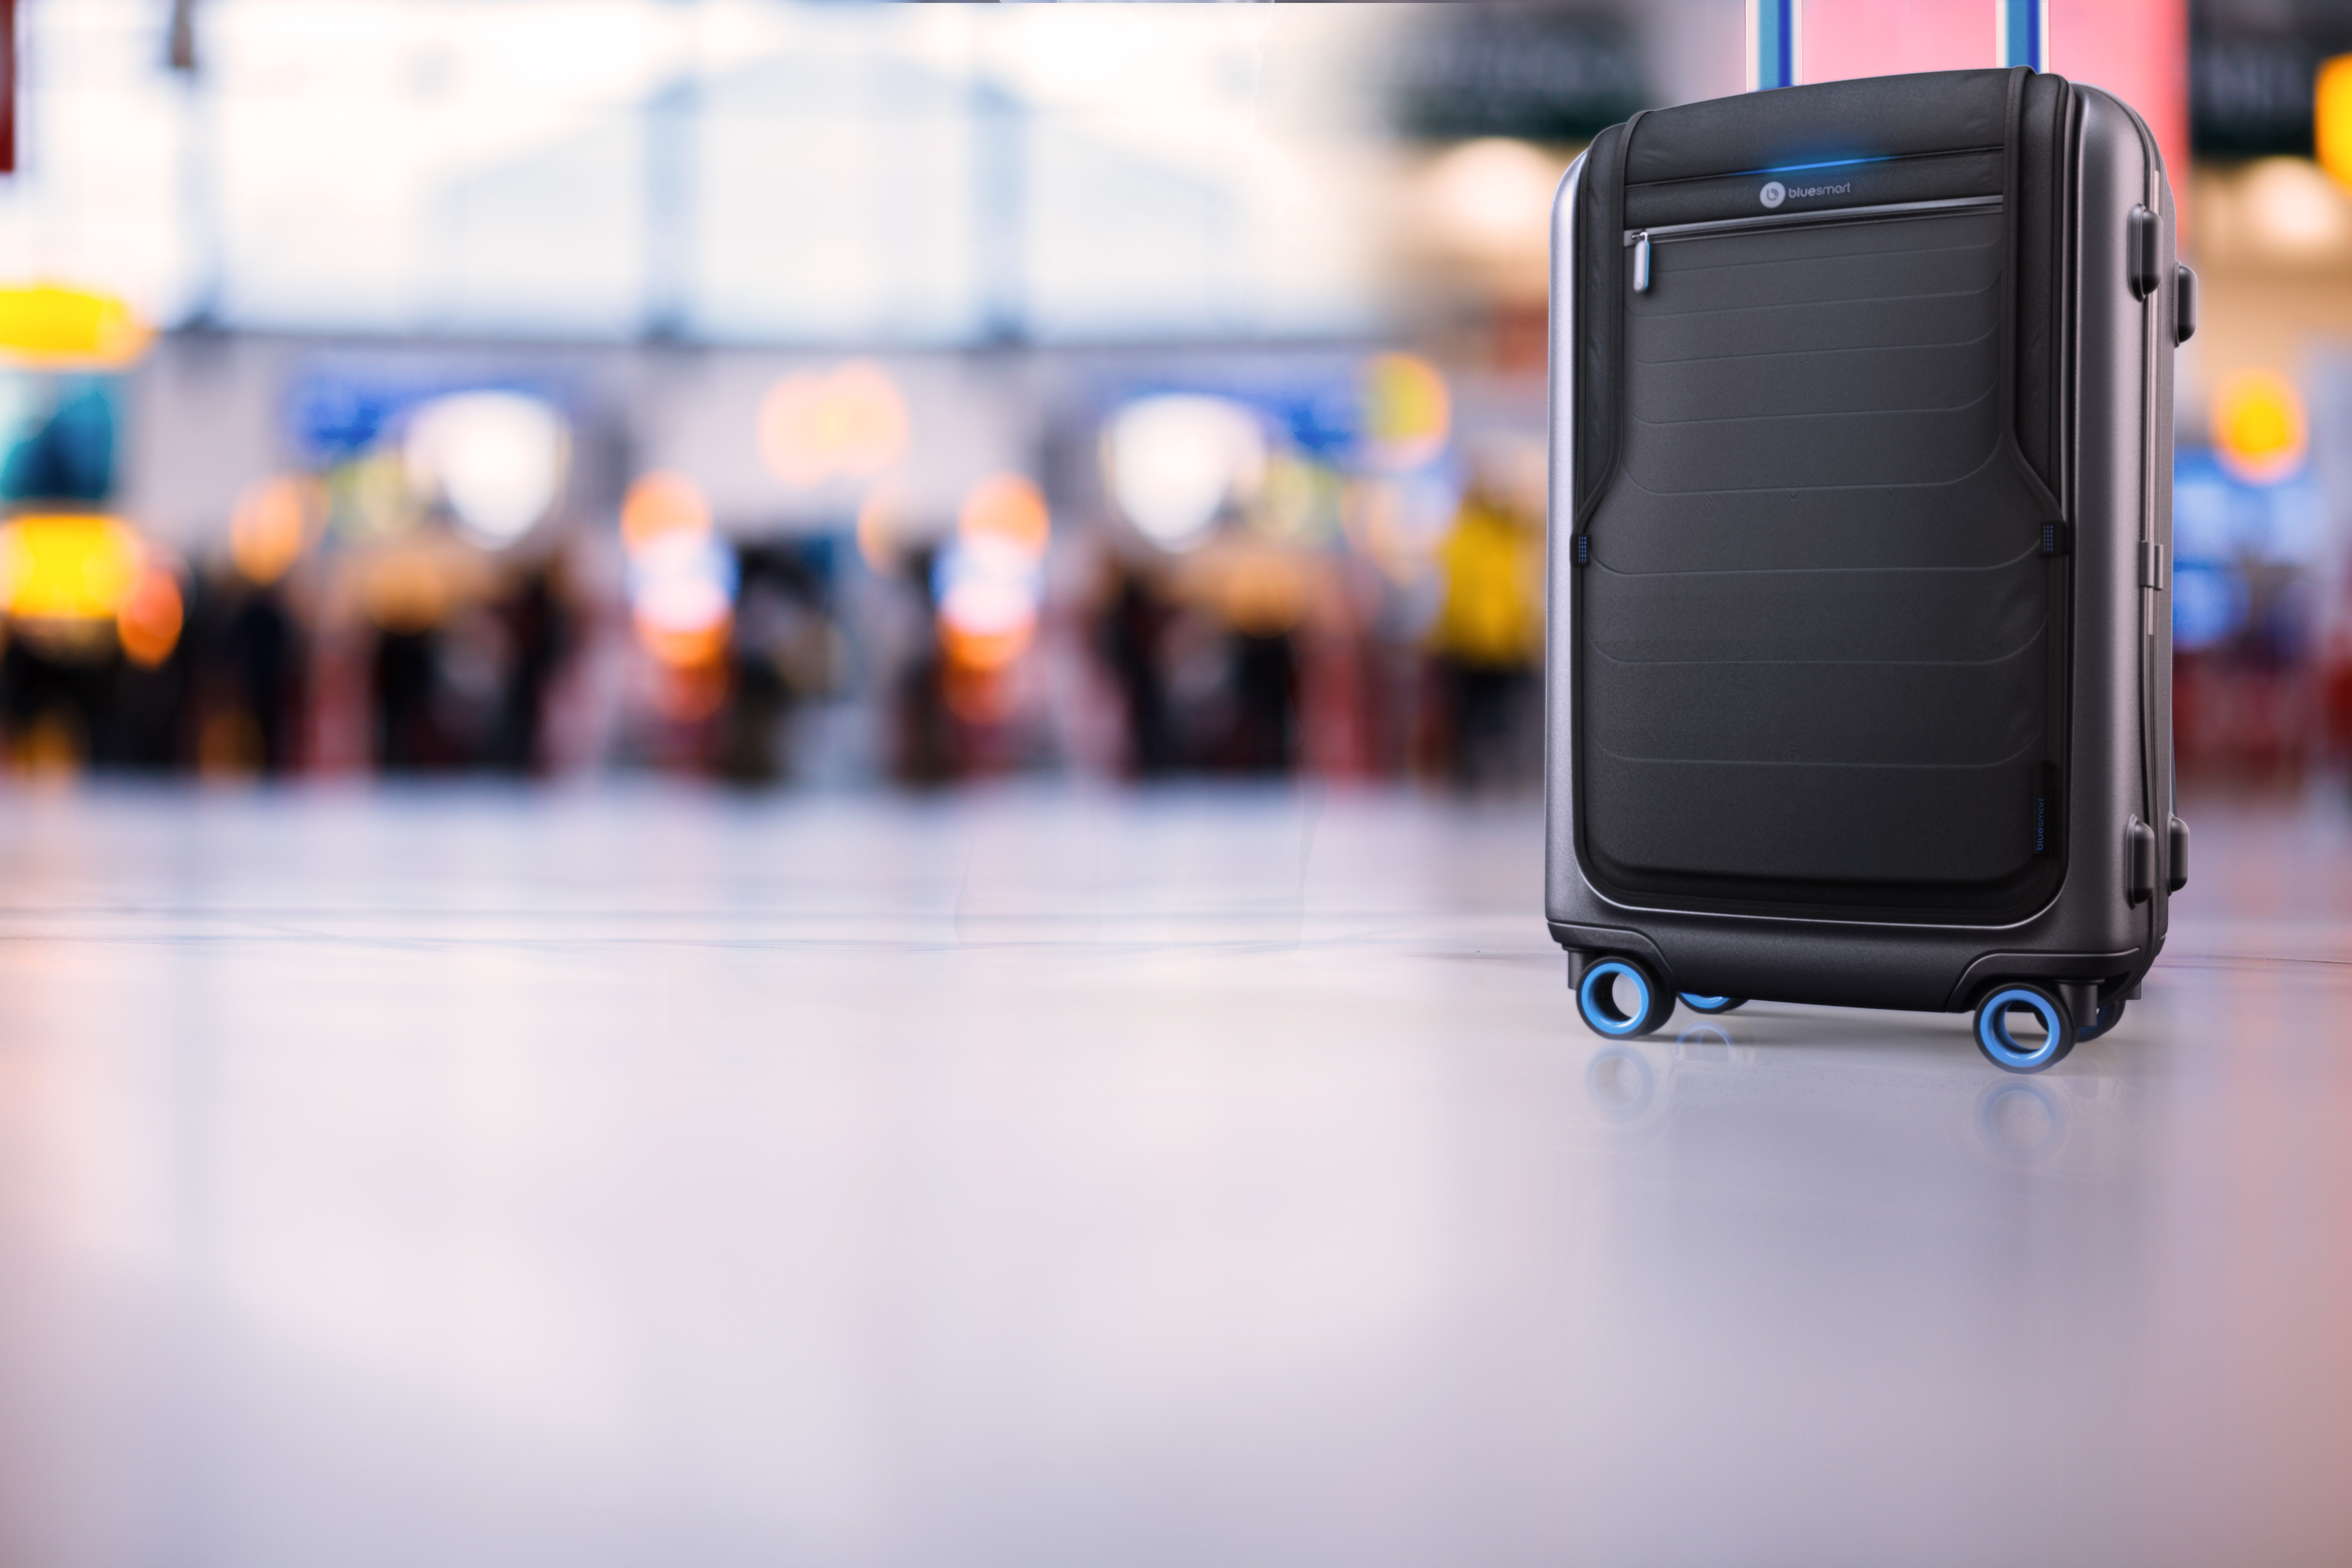 Bluesmart la valise connectée innovante